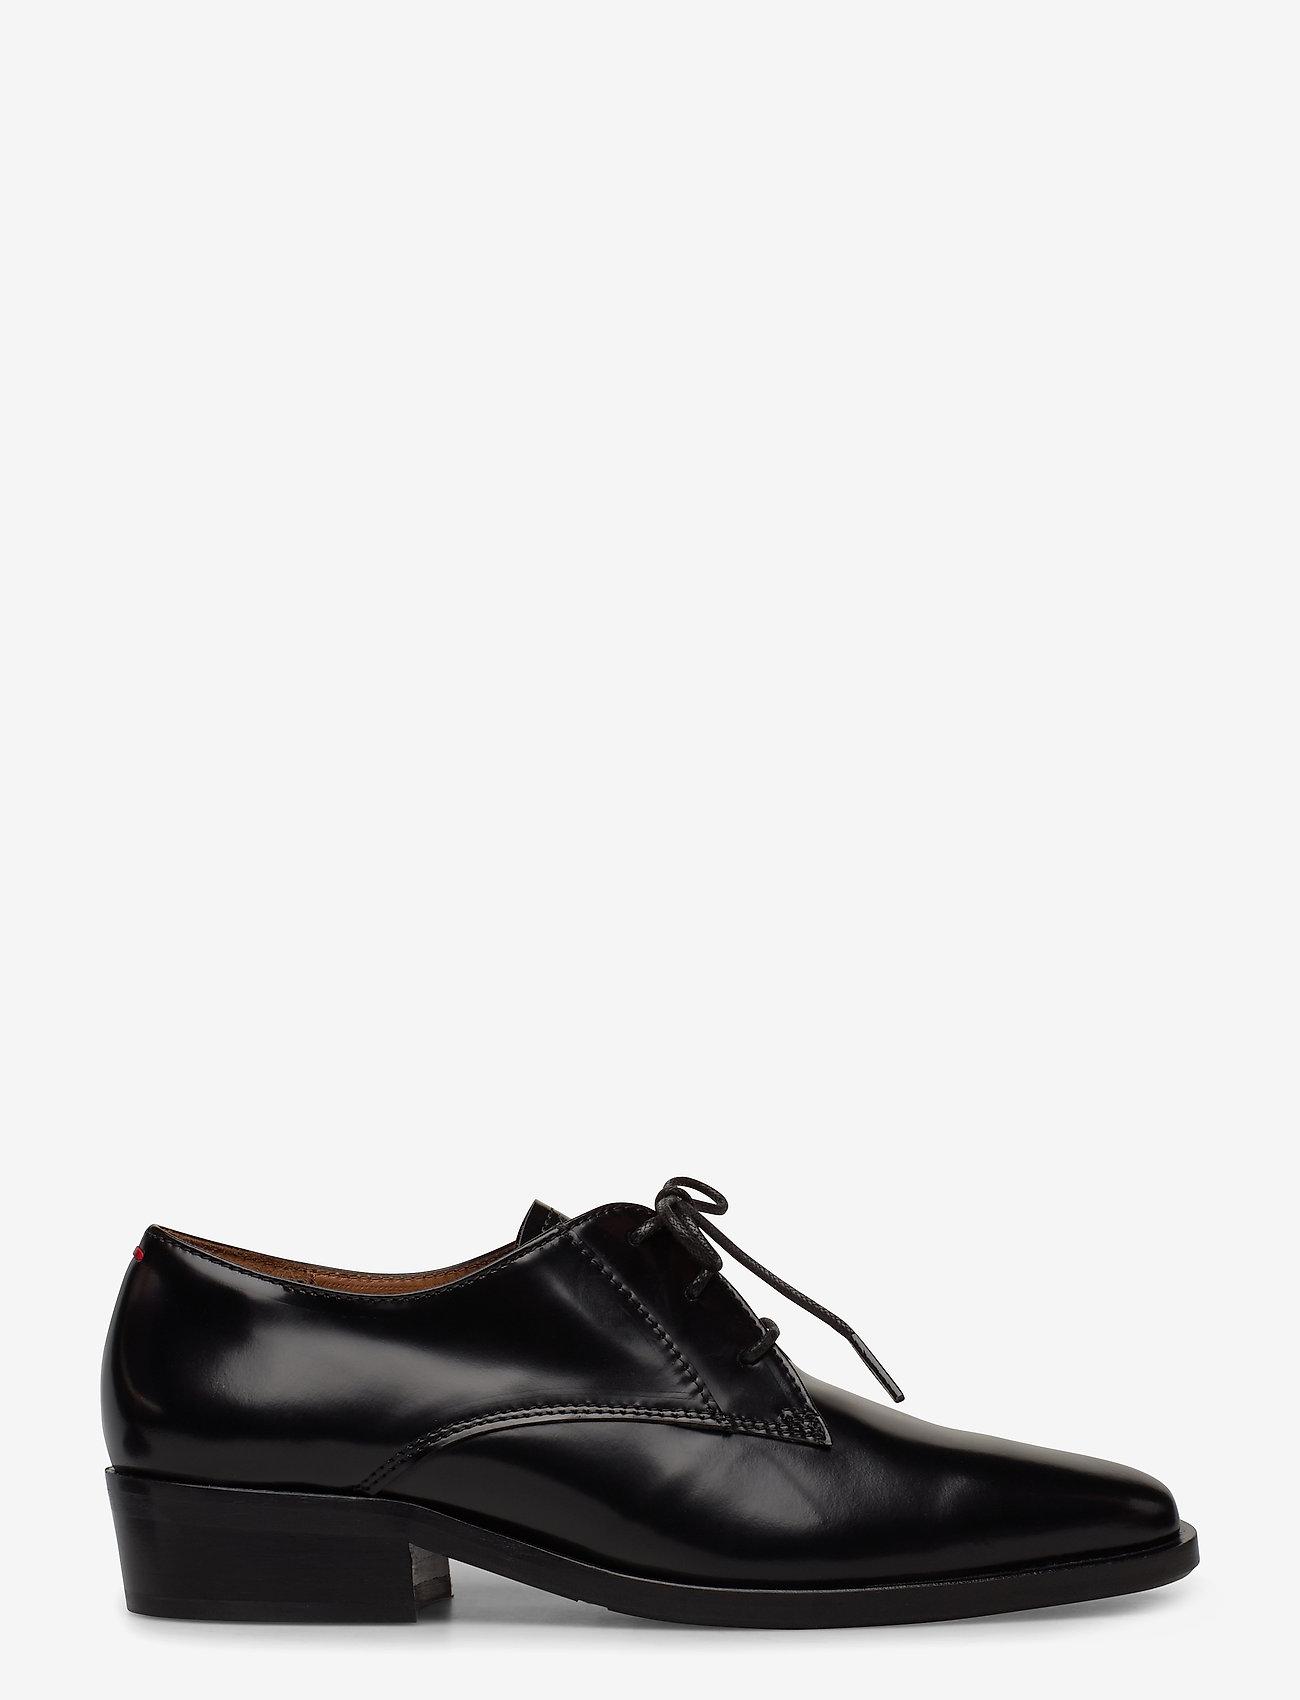 Billi Bi - Shoes 4700 - buty sznurowane - black polido  900 - 1